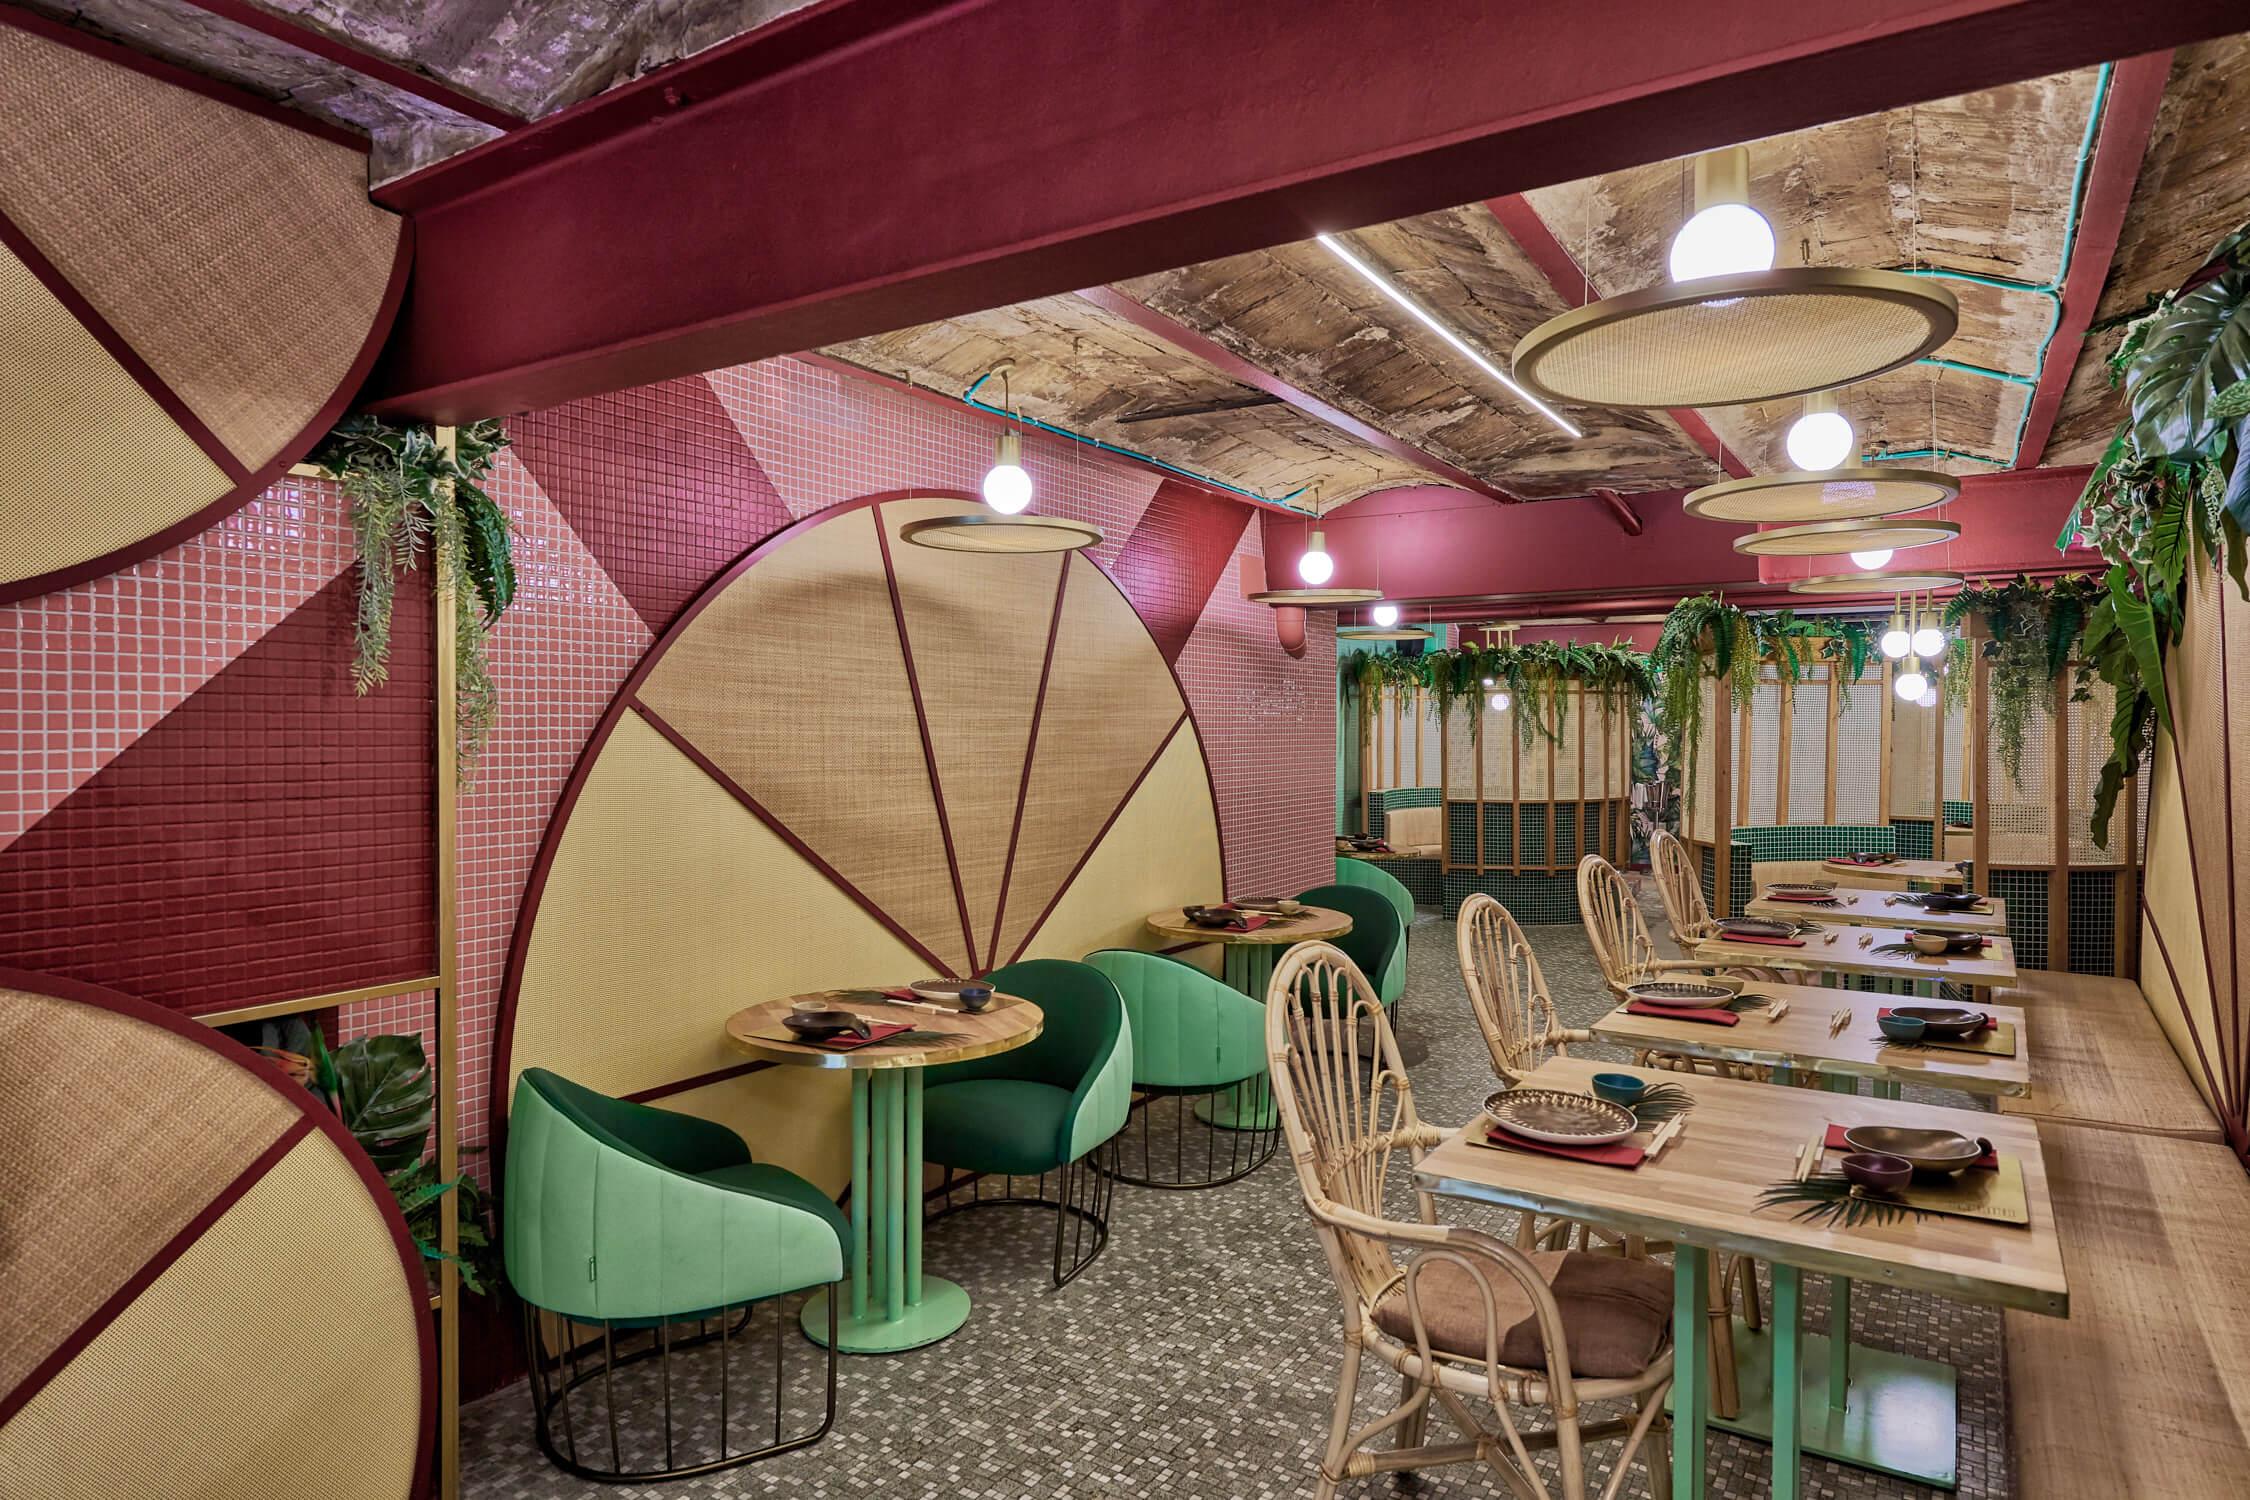 Il Giappone incontra il Brasile nel ristorane Kaikaya | Collater.al